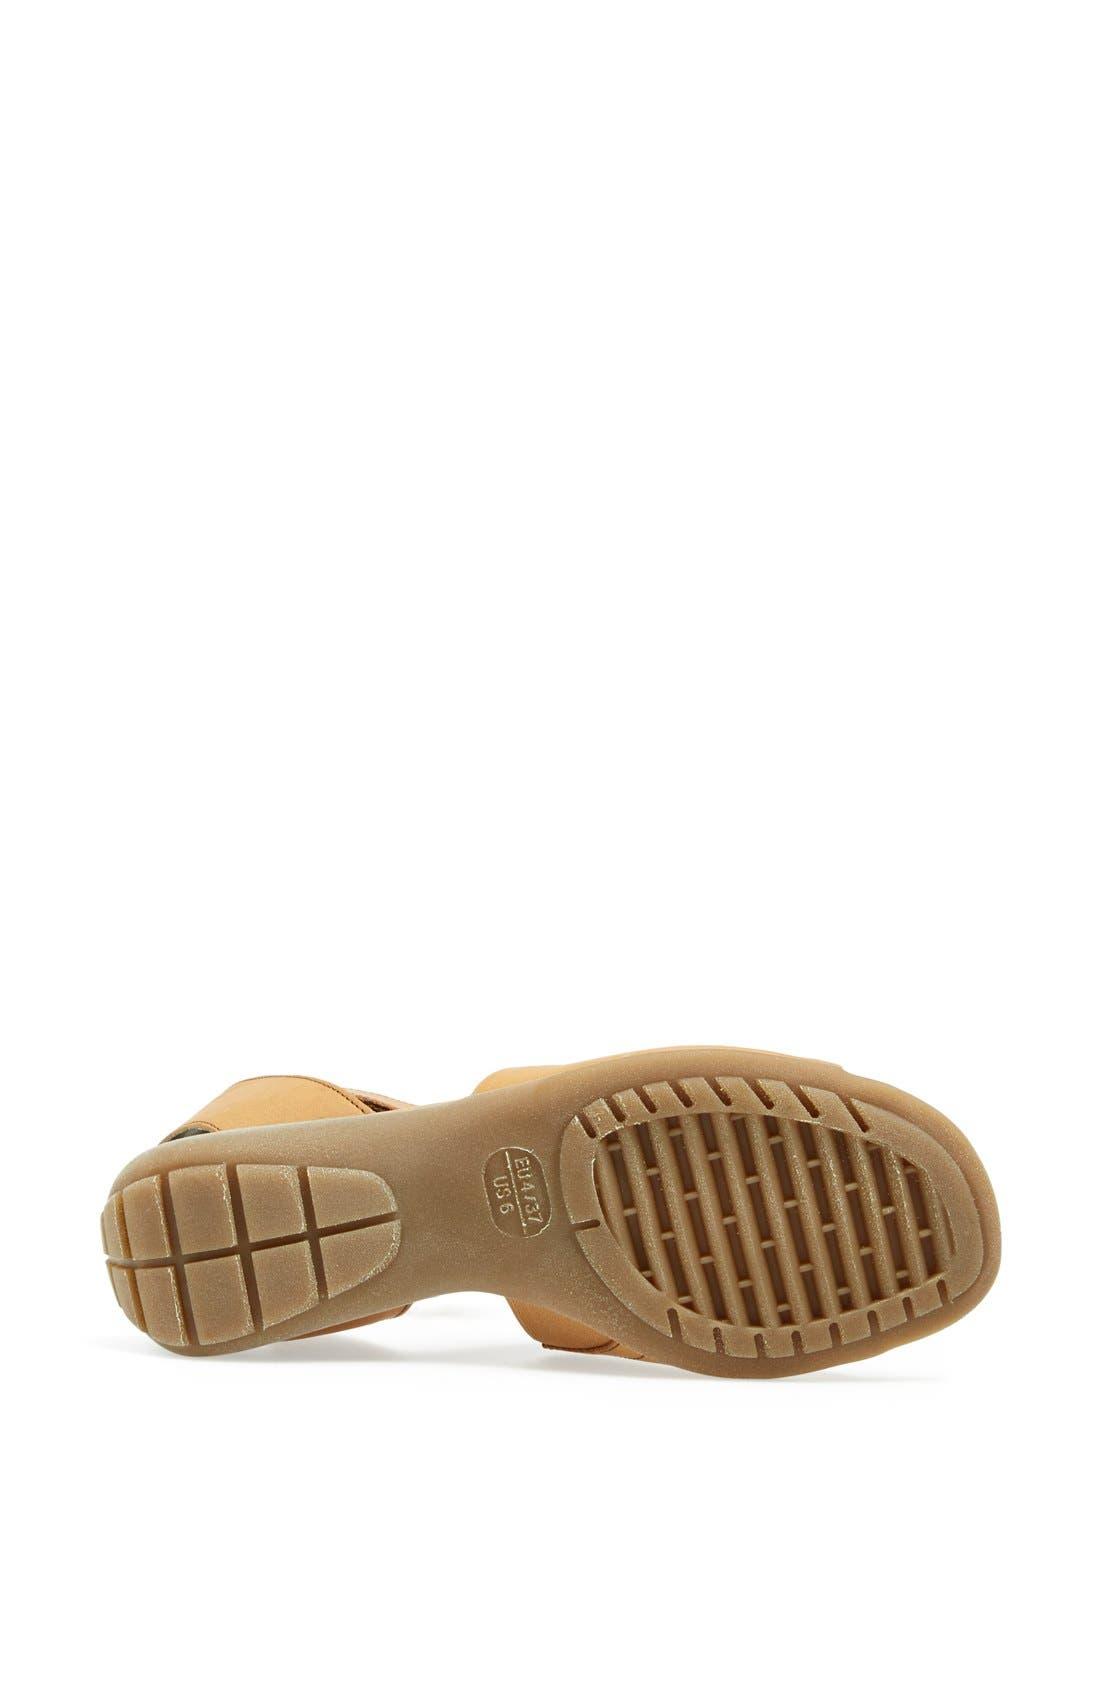 'Beglad' Leather Ankle Strap Sandal,                             Alternate thumbnail 57, color,